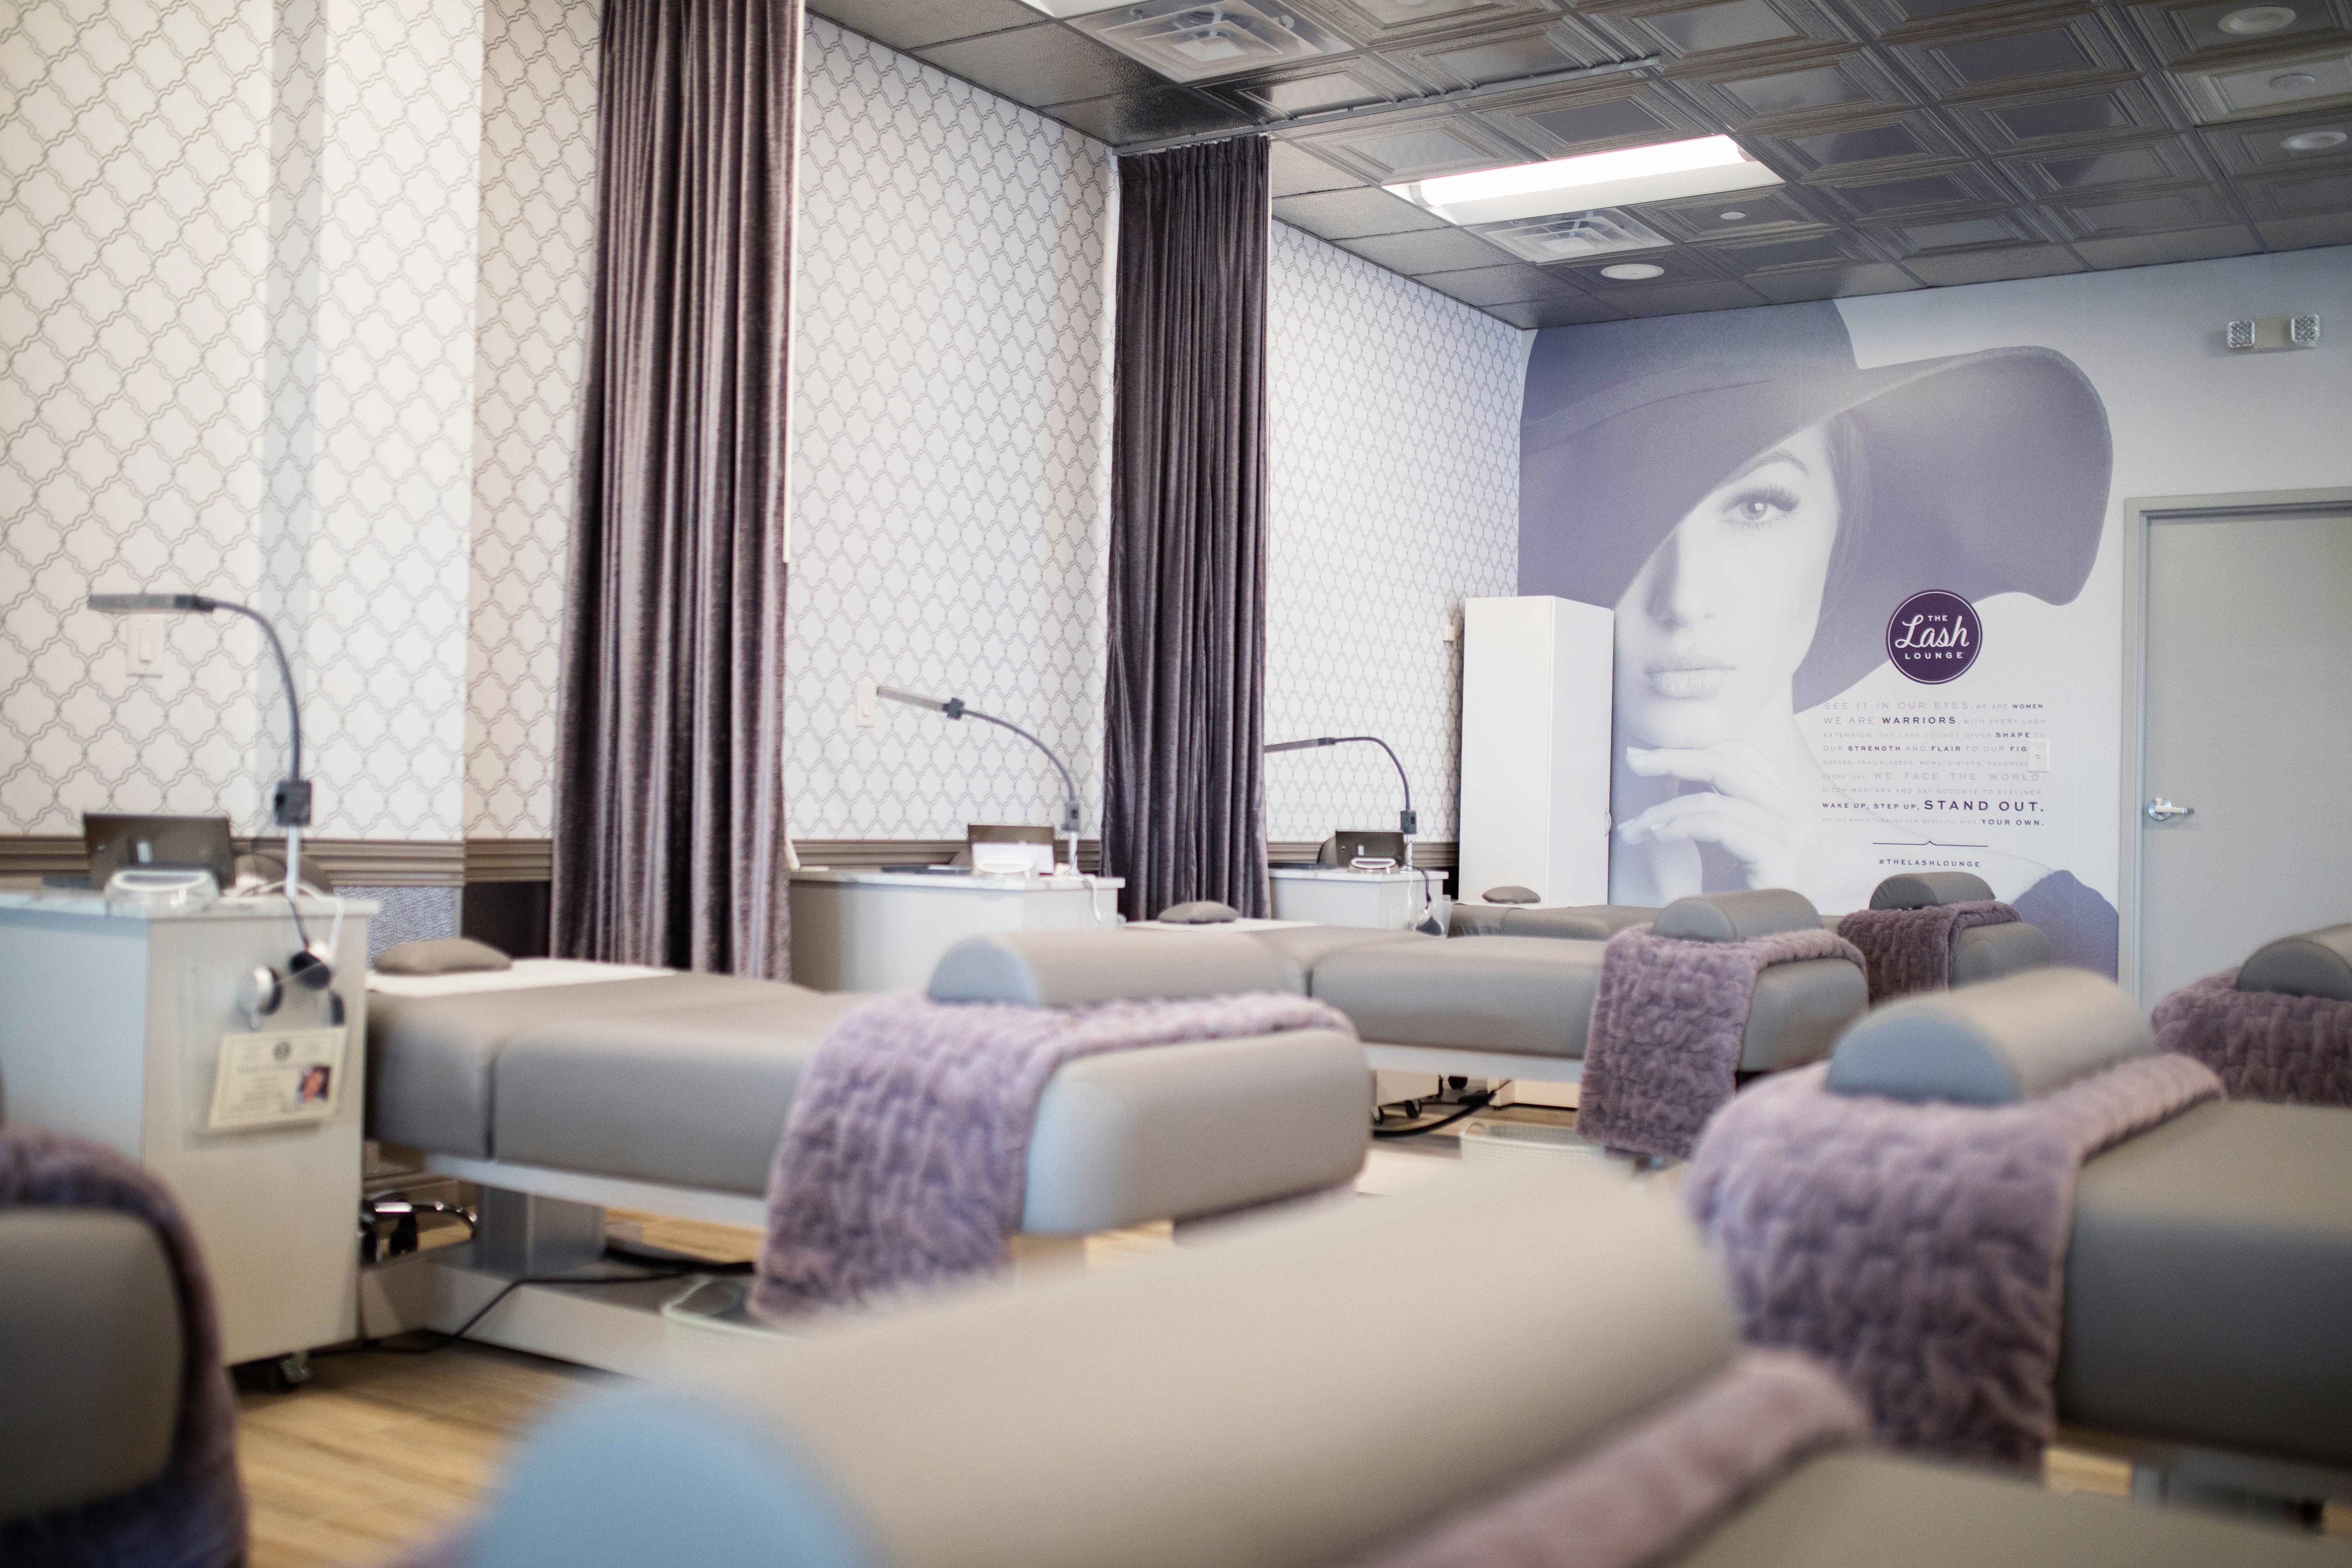 The Lash Lounge | LinkedIn